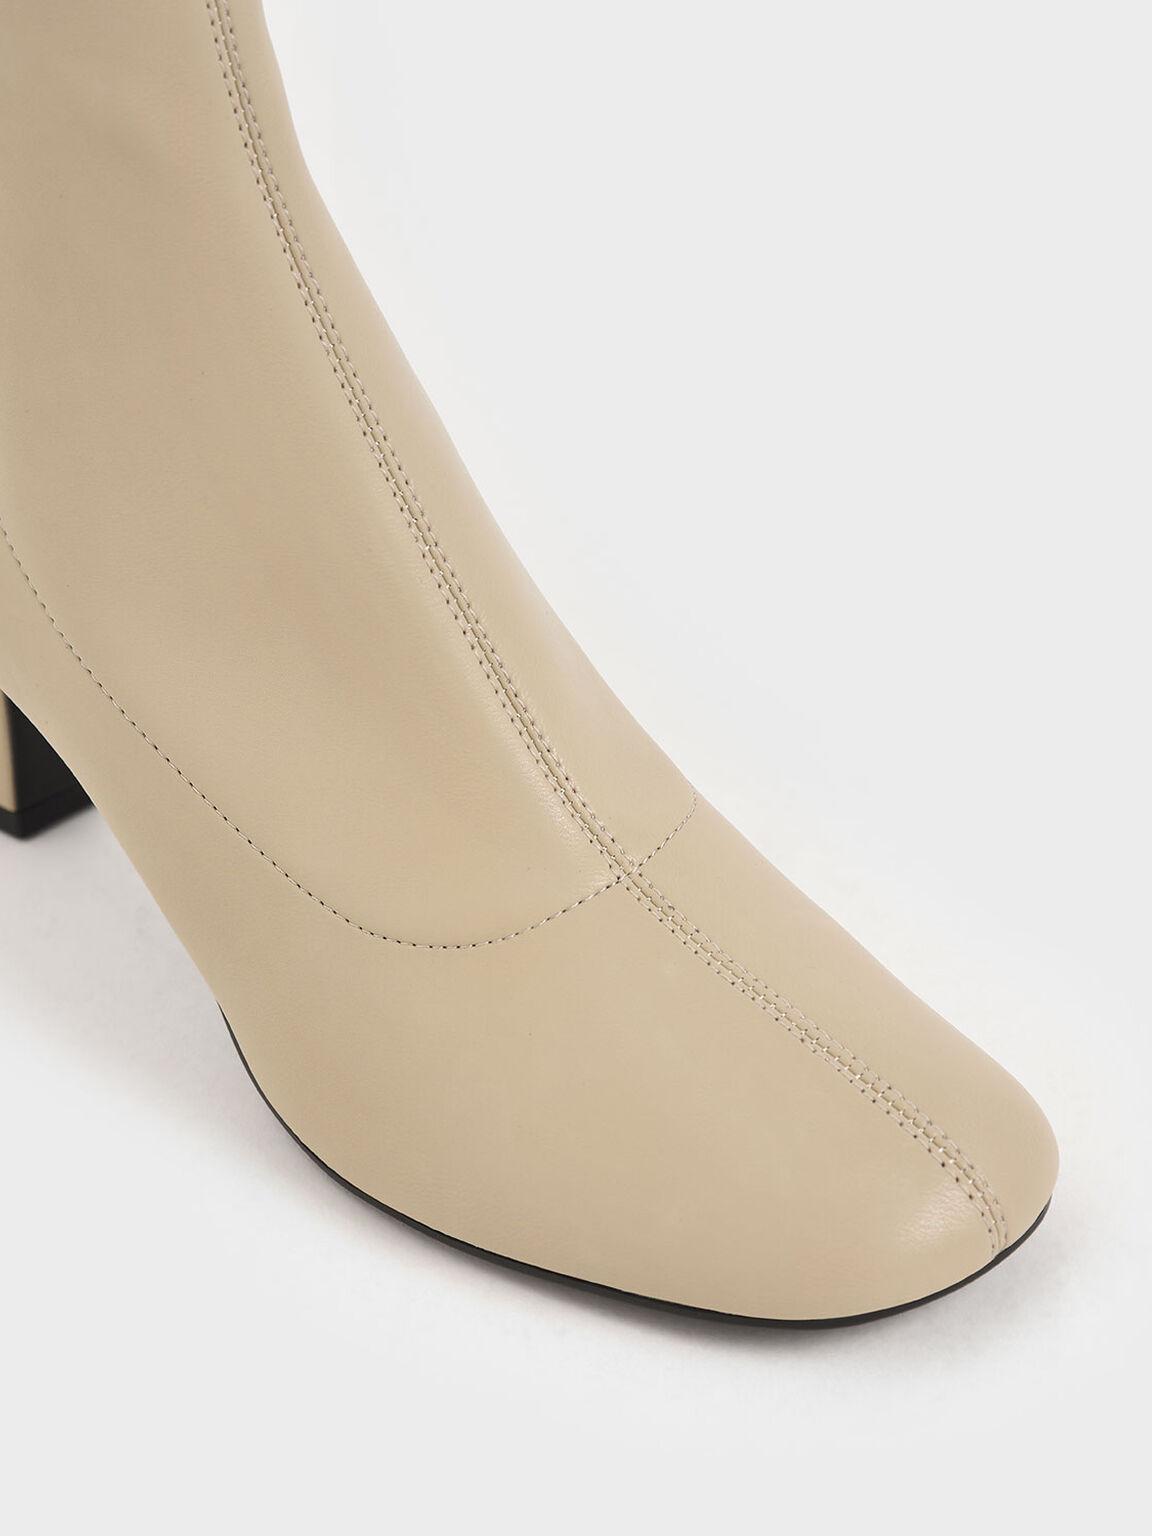 Spool Heel Ankle Boots, Beige, hi-res